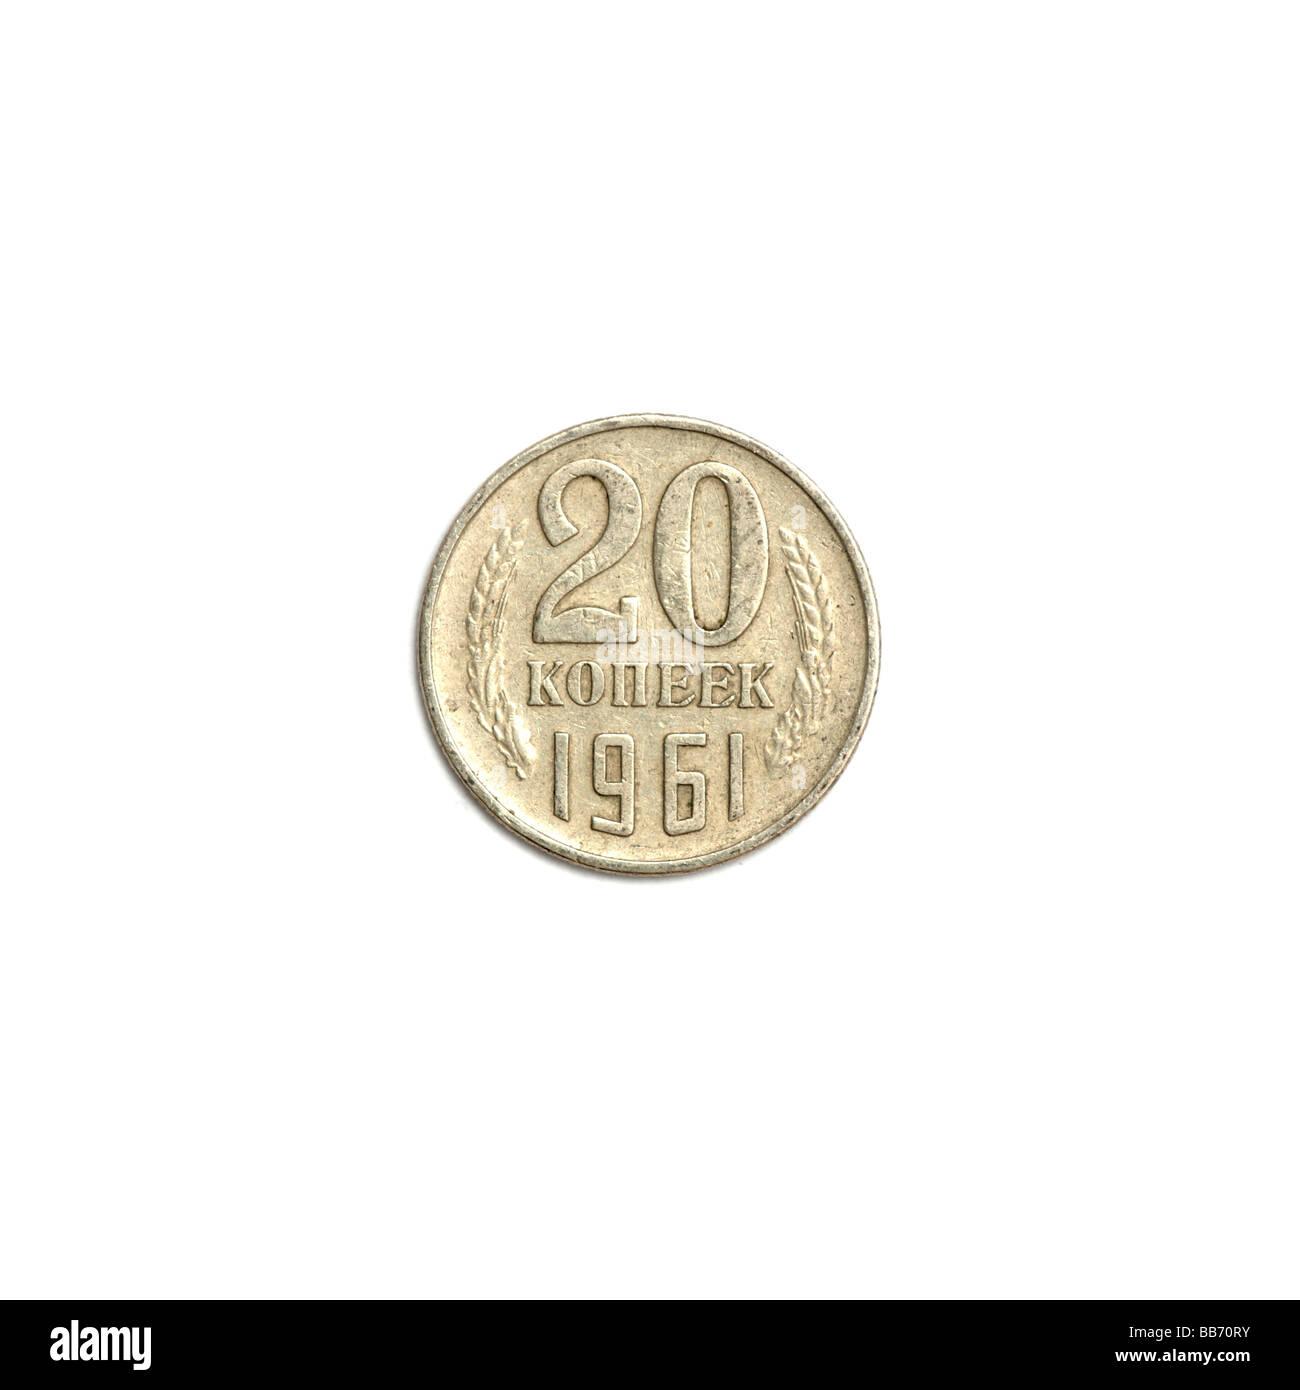 '20 kopeks coin - USSR' - Stock Image